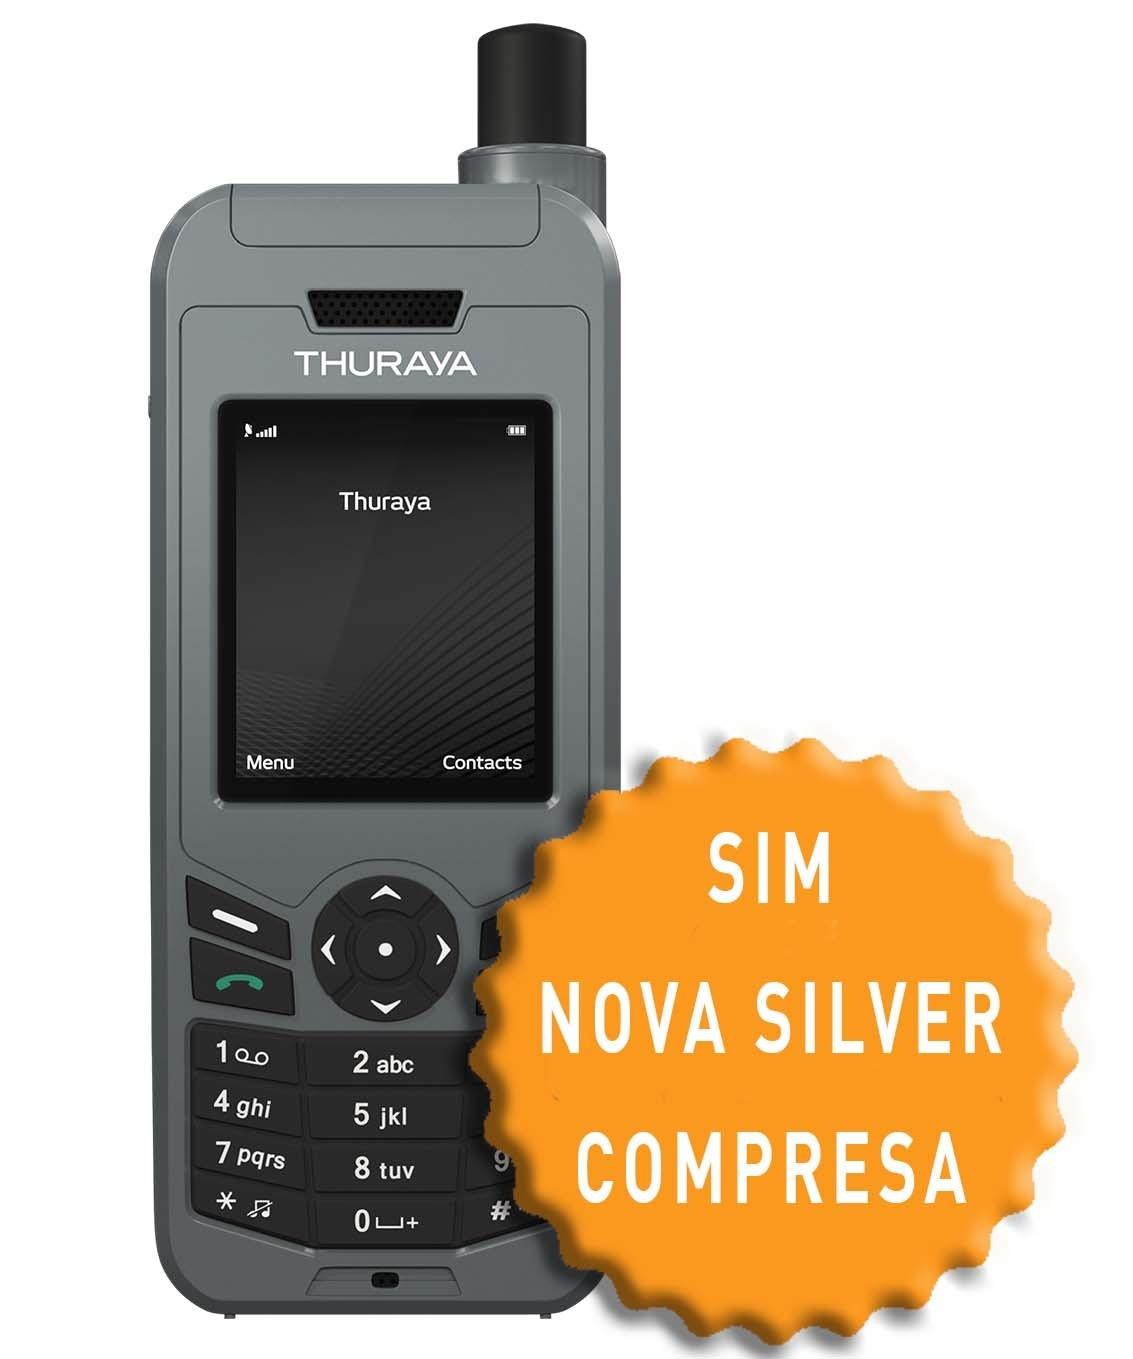 Thuraya XT-LITE compresa SIM NOVA PLUS